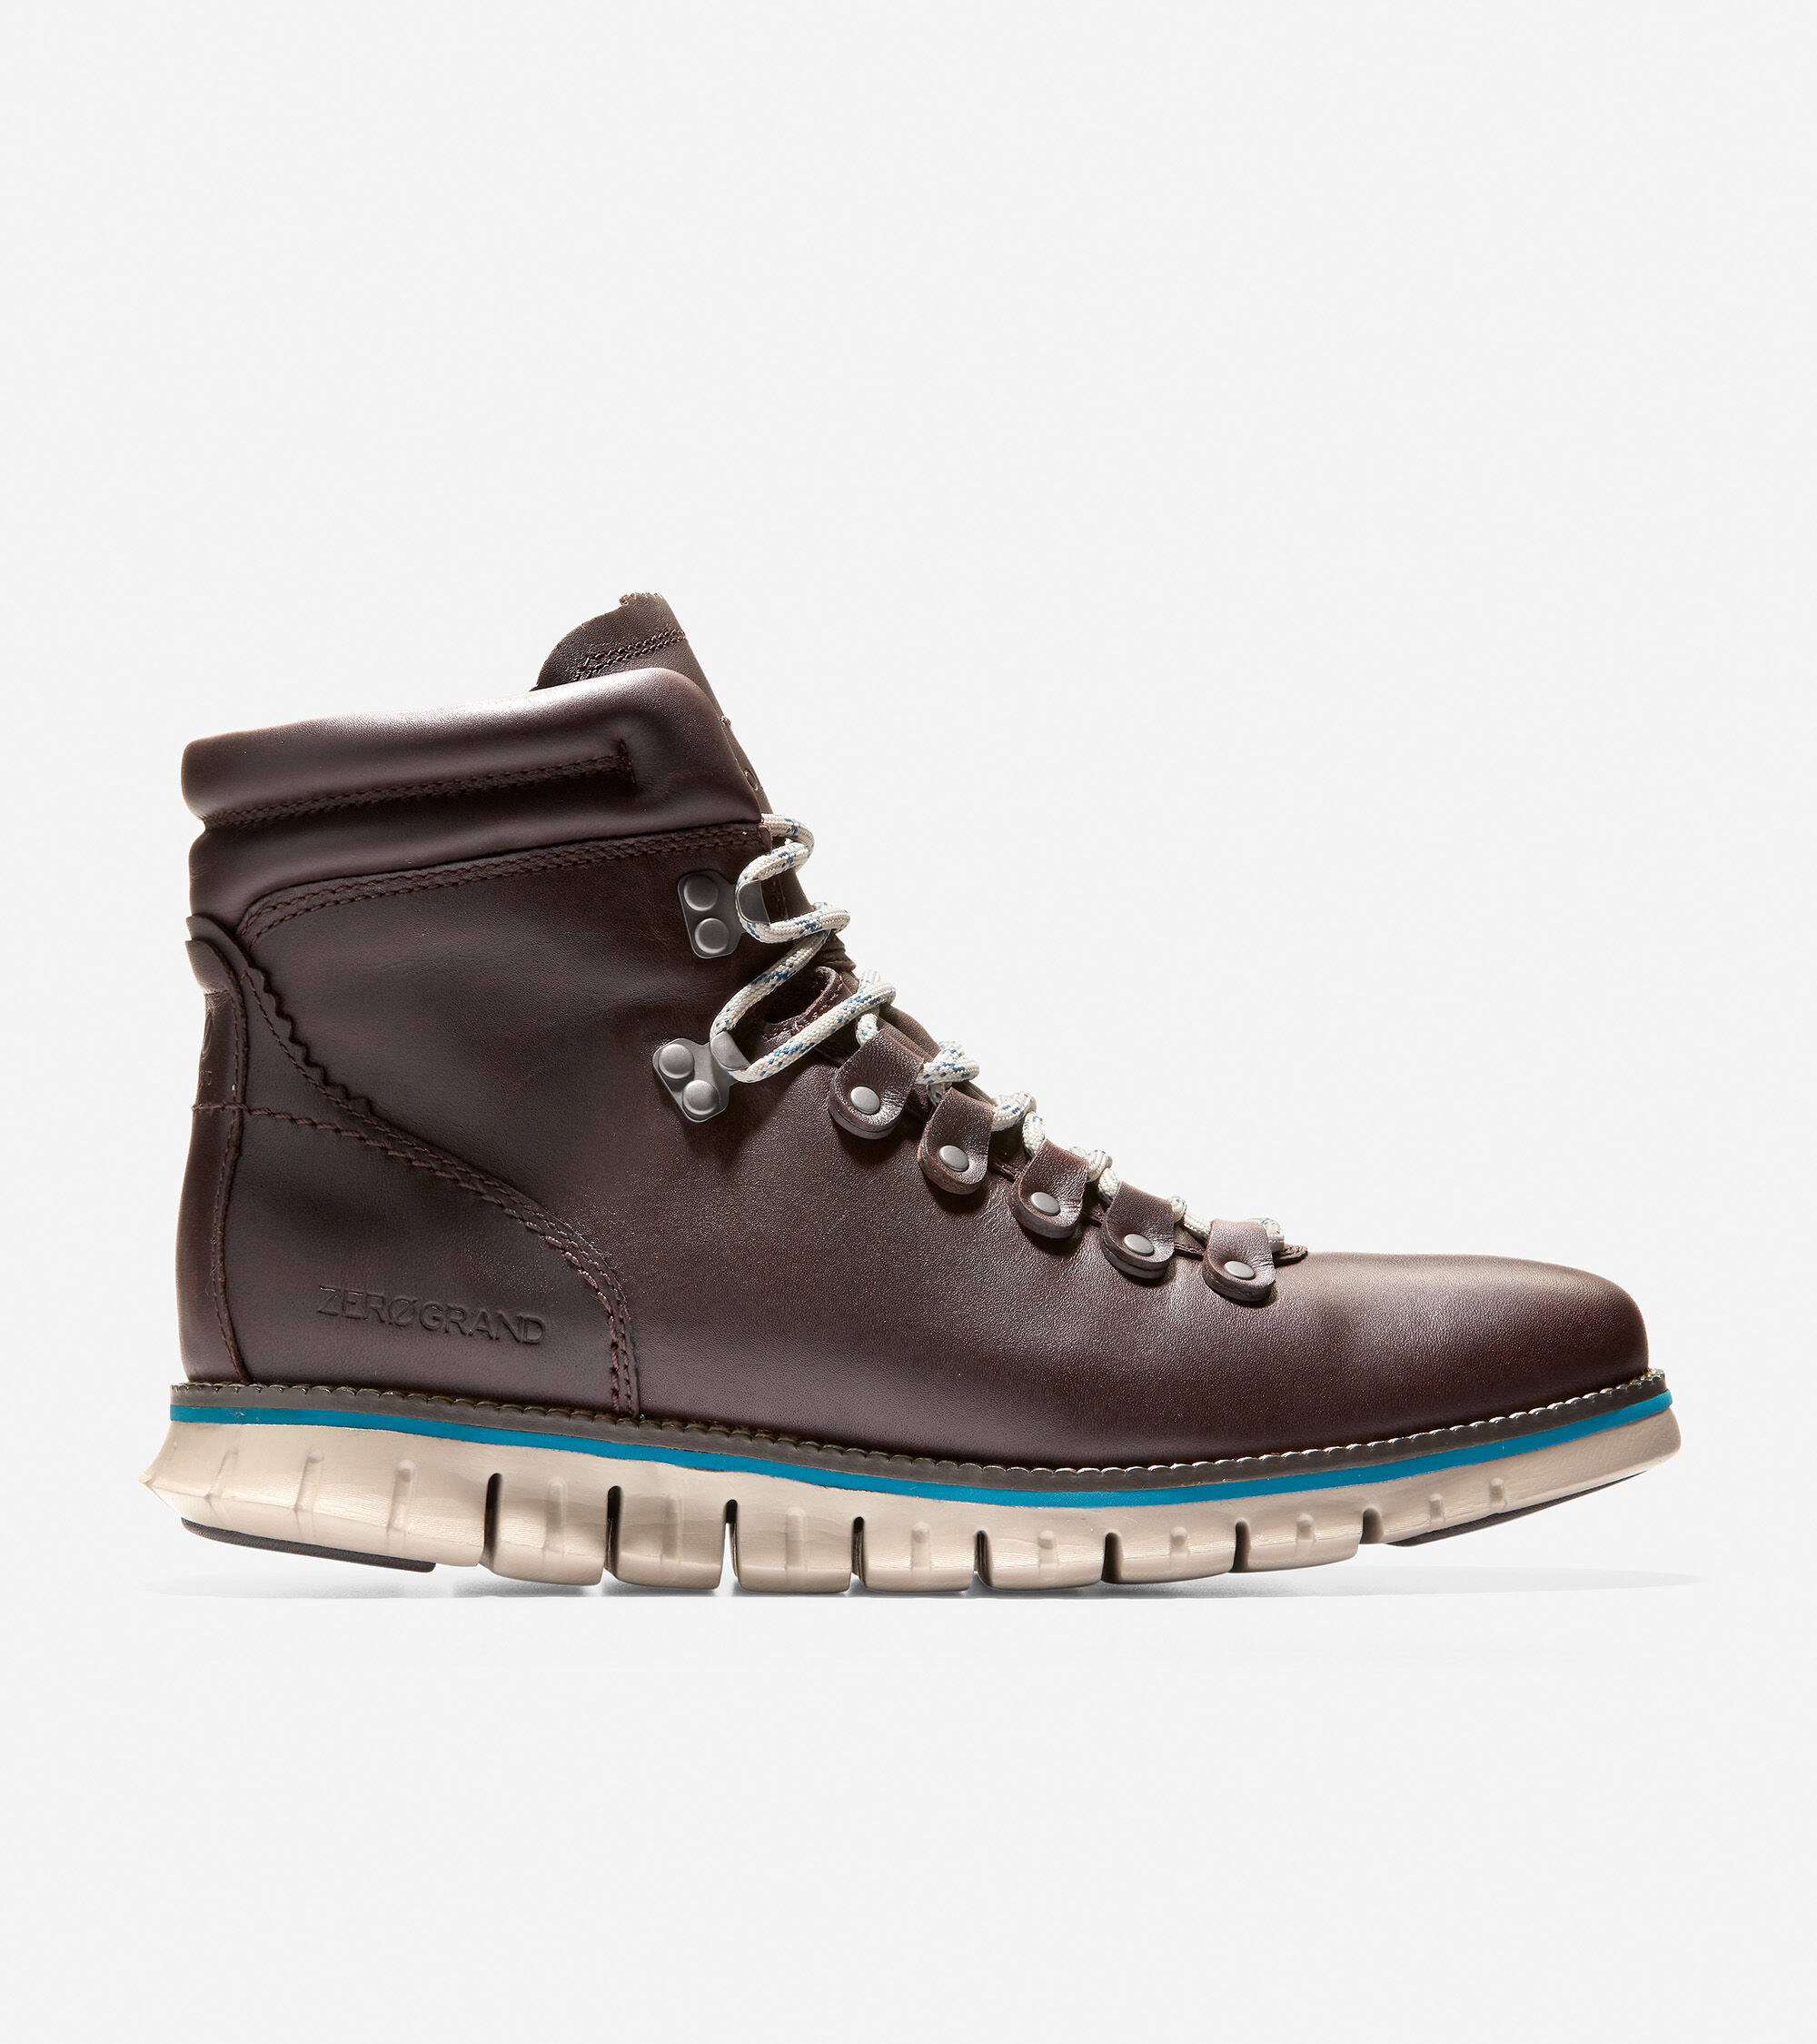 cole haan mens shoes outlet